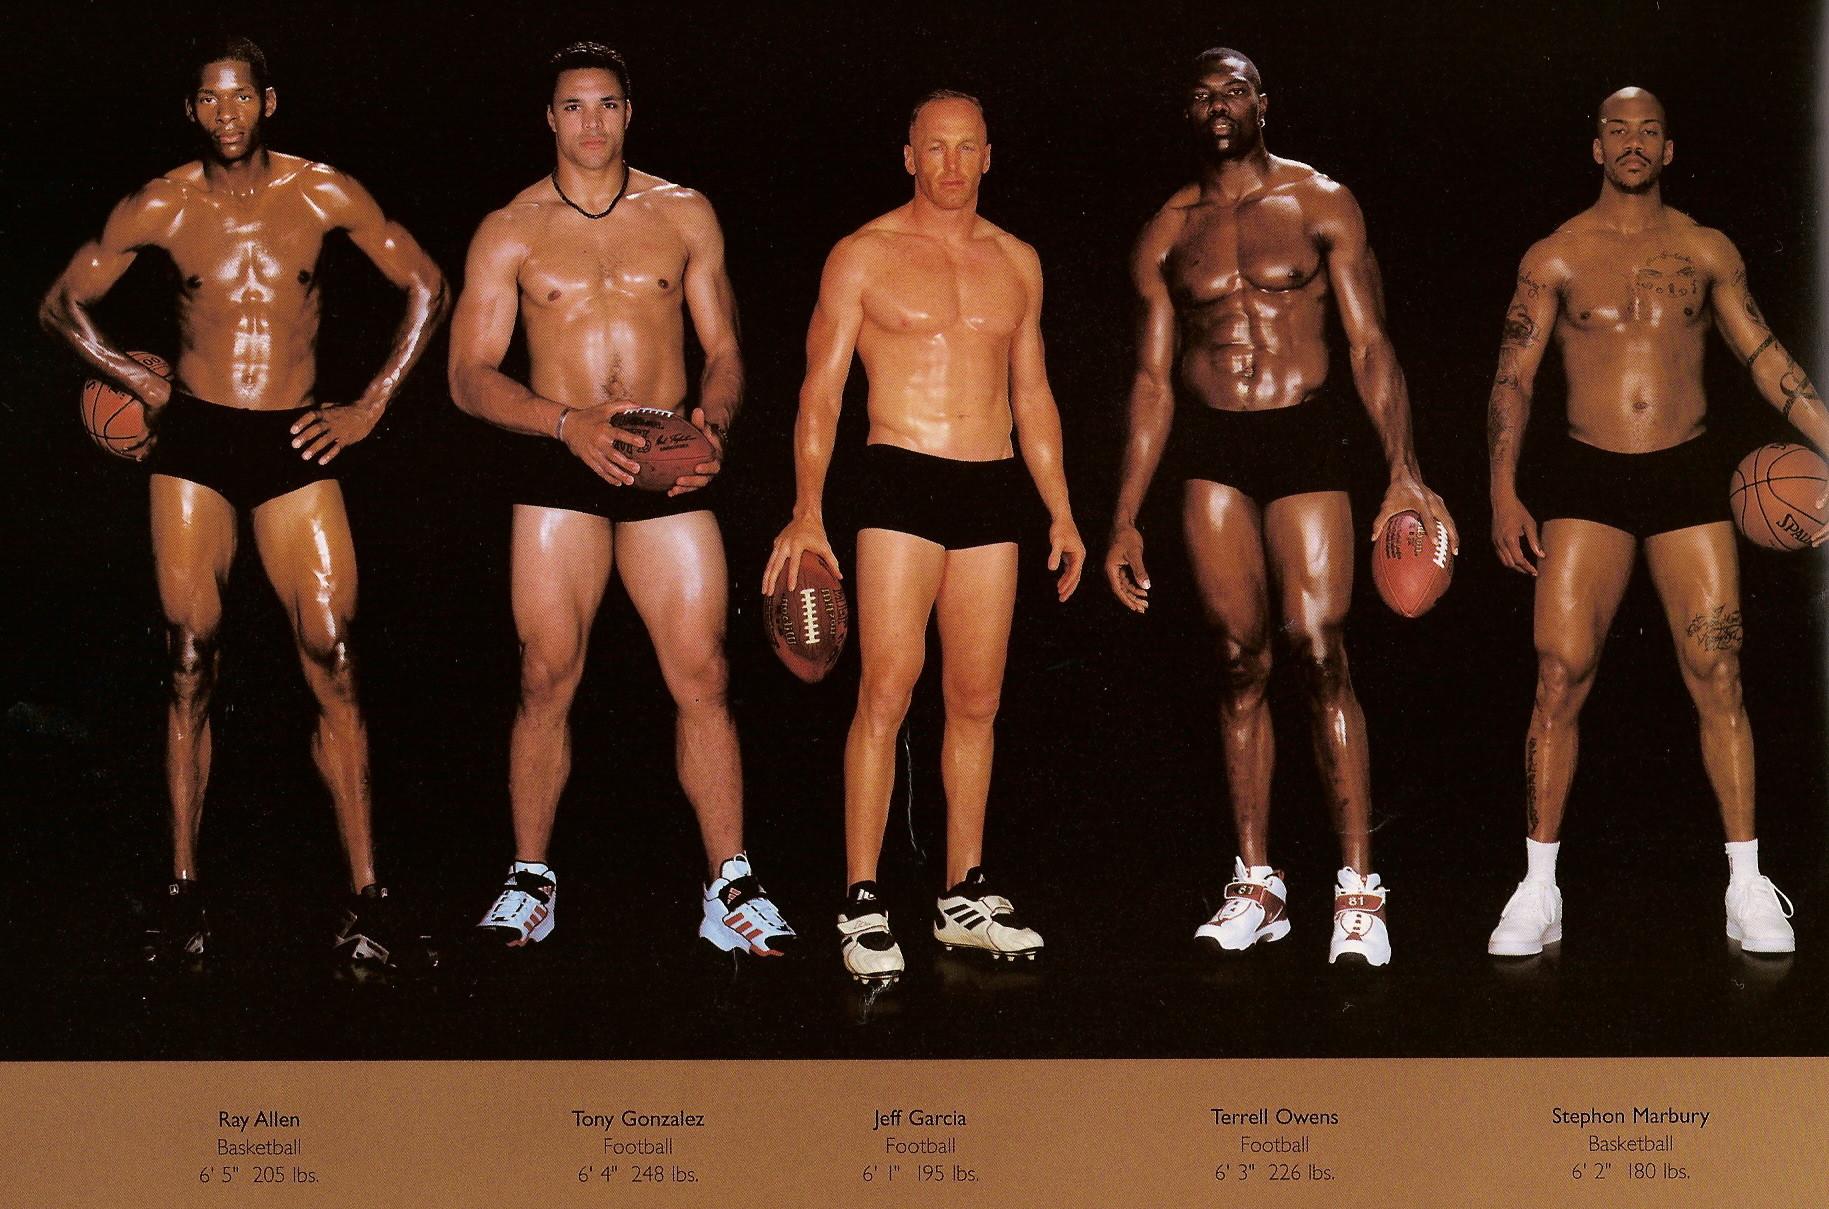 Howard Schatz / слева направо: баскетбол, американский футбол, тоже американский футбол, снова американский футбол, баскетбол.